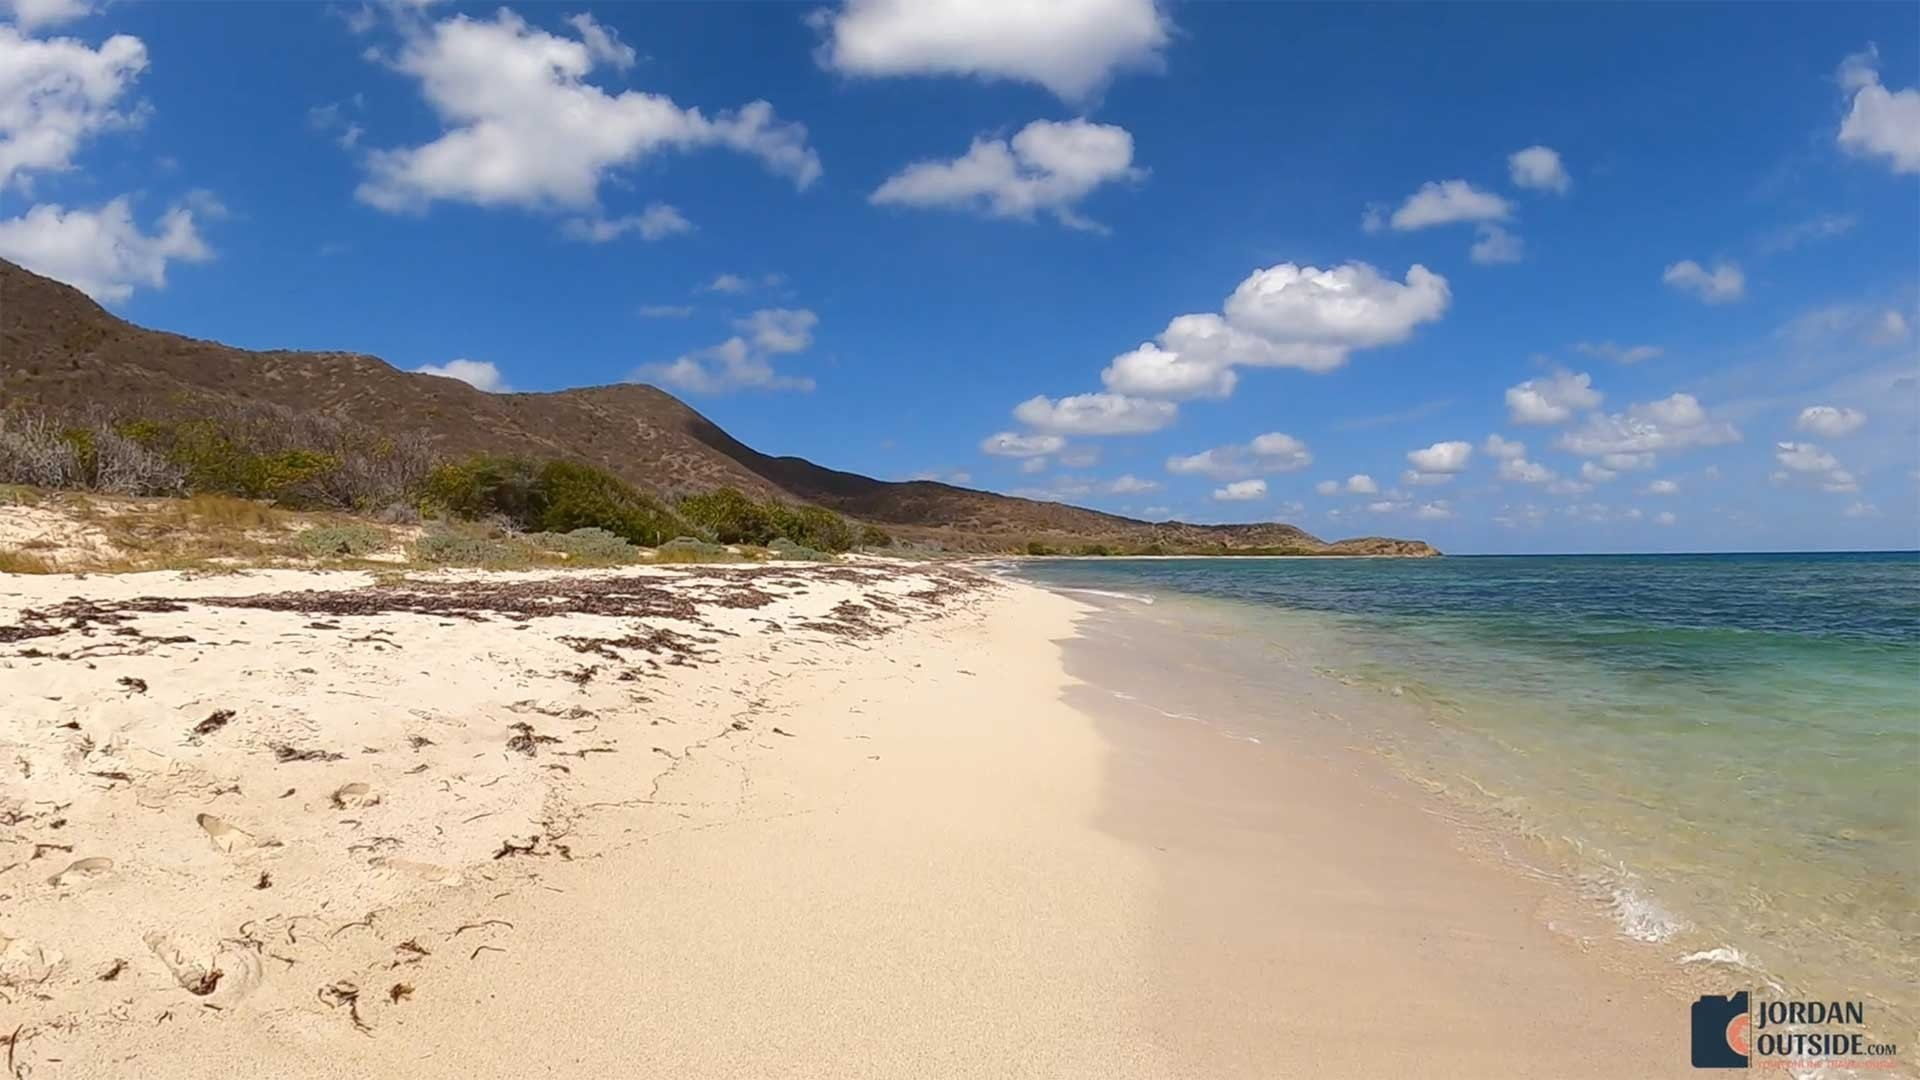 Soft Sand at Jack's Bay Beach, St. Croix